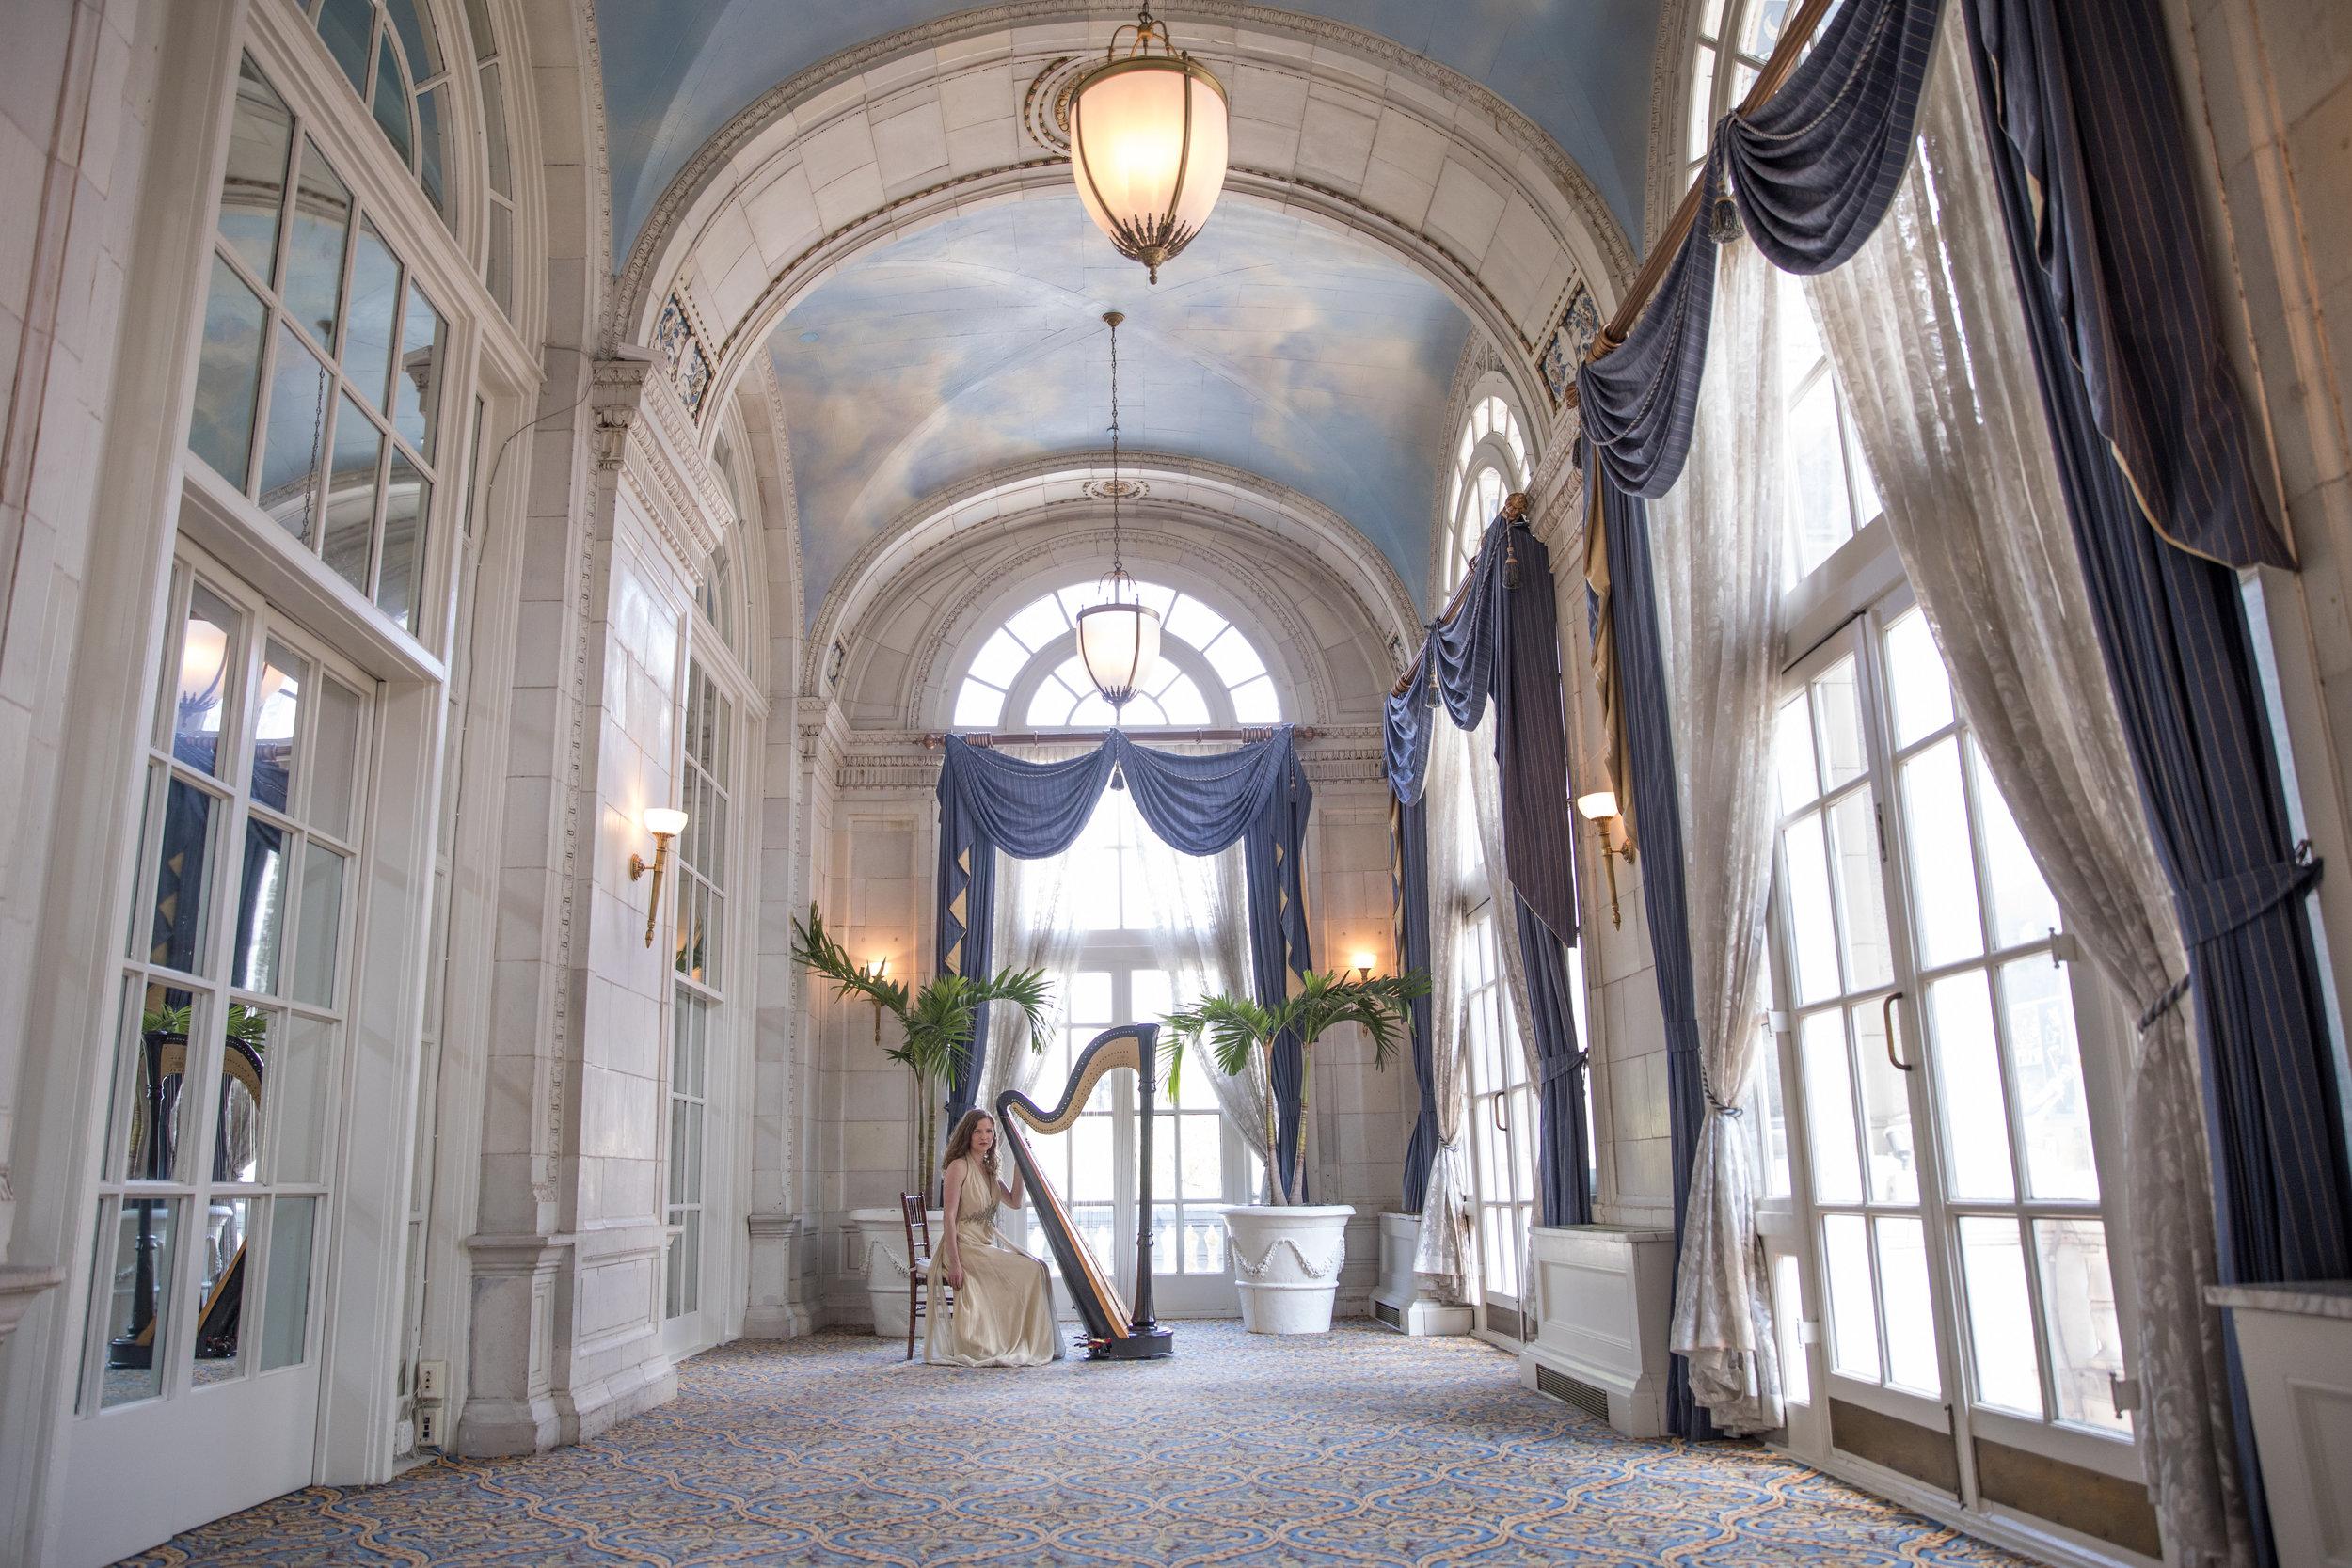 Agnes_Harp_Hermitage-Hotel-170.jpg